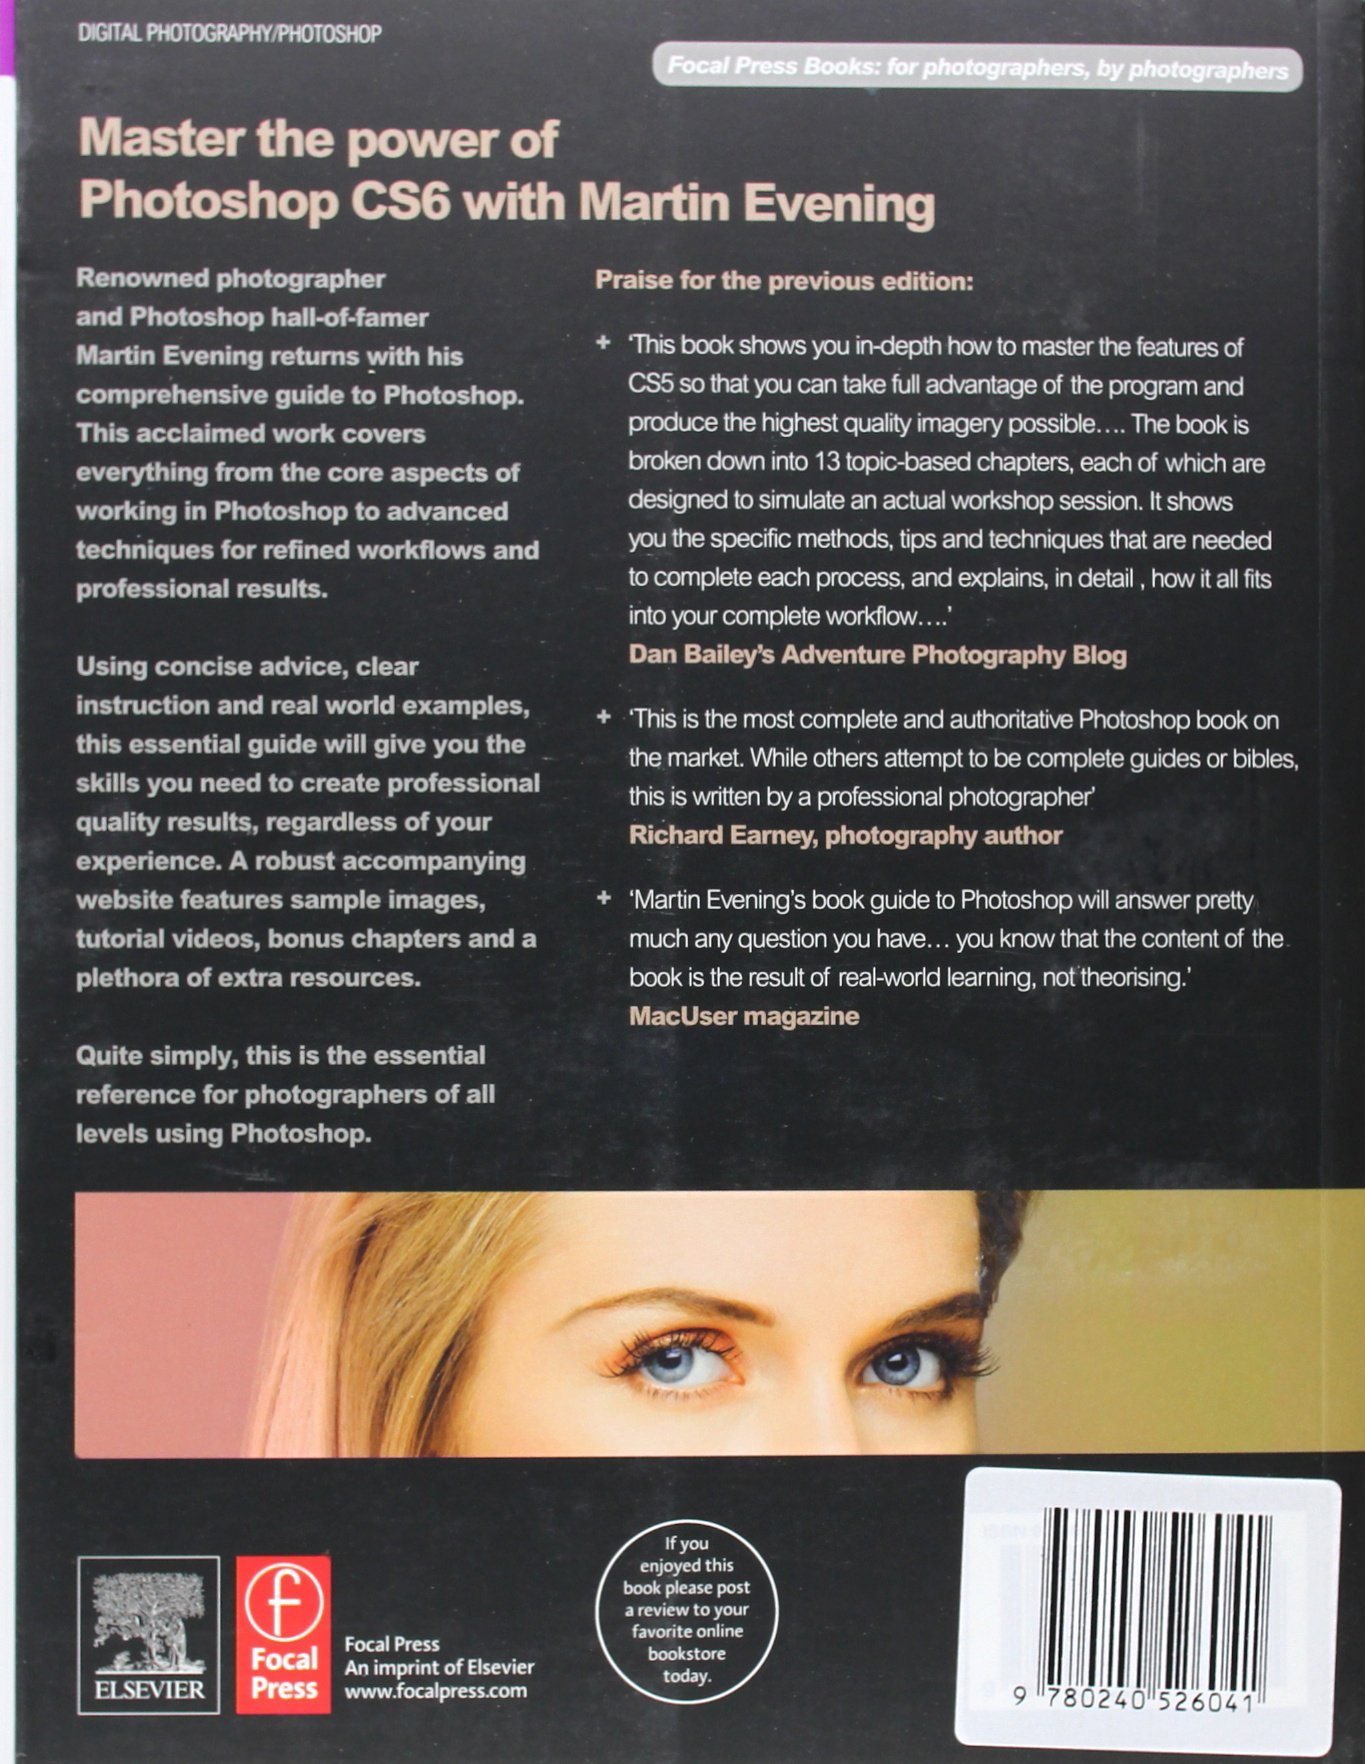 Adobe Photoshop Cs6 For Photographers A Professional Image Editors